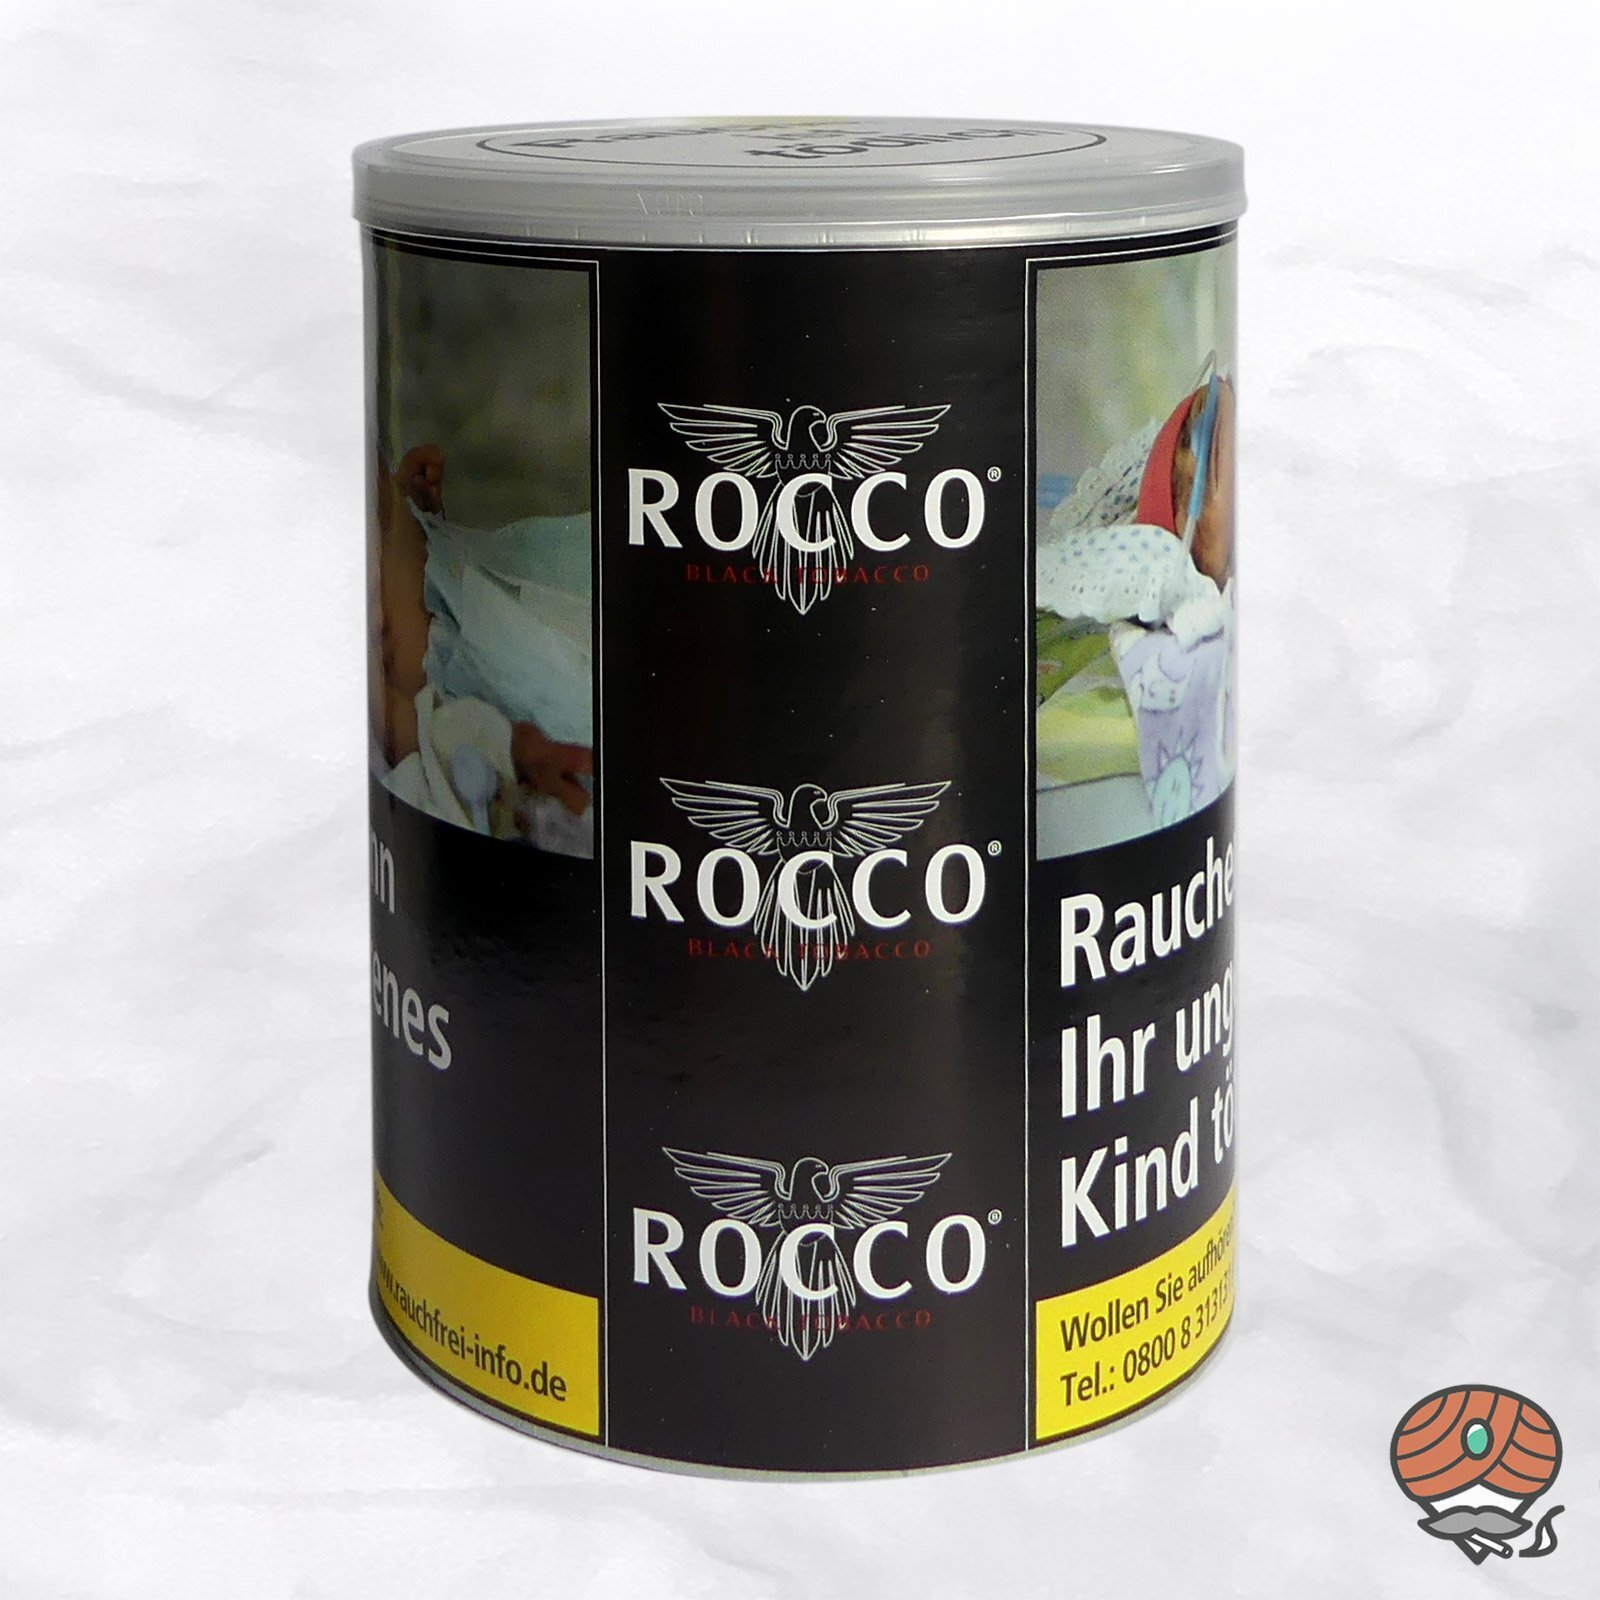 ROCCO Black Tobacco Drehtabak 130 g Dose